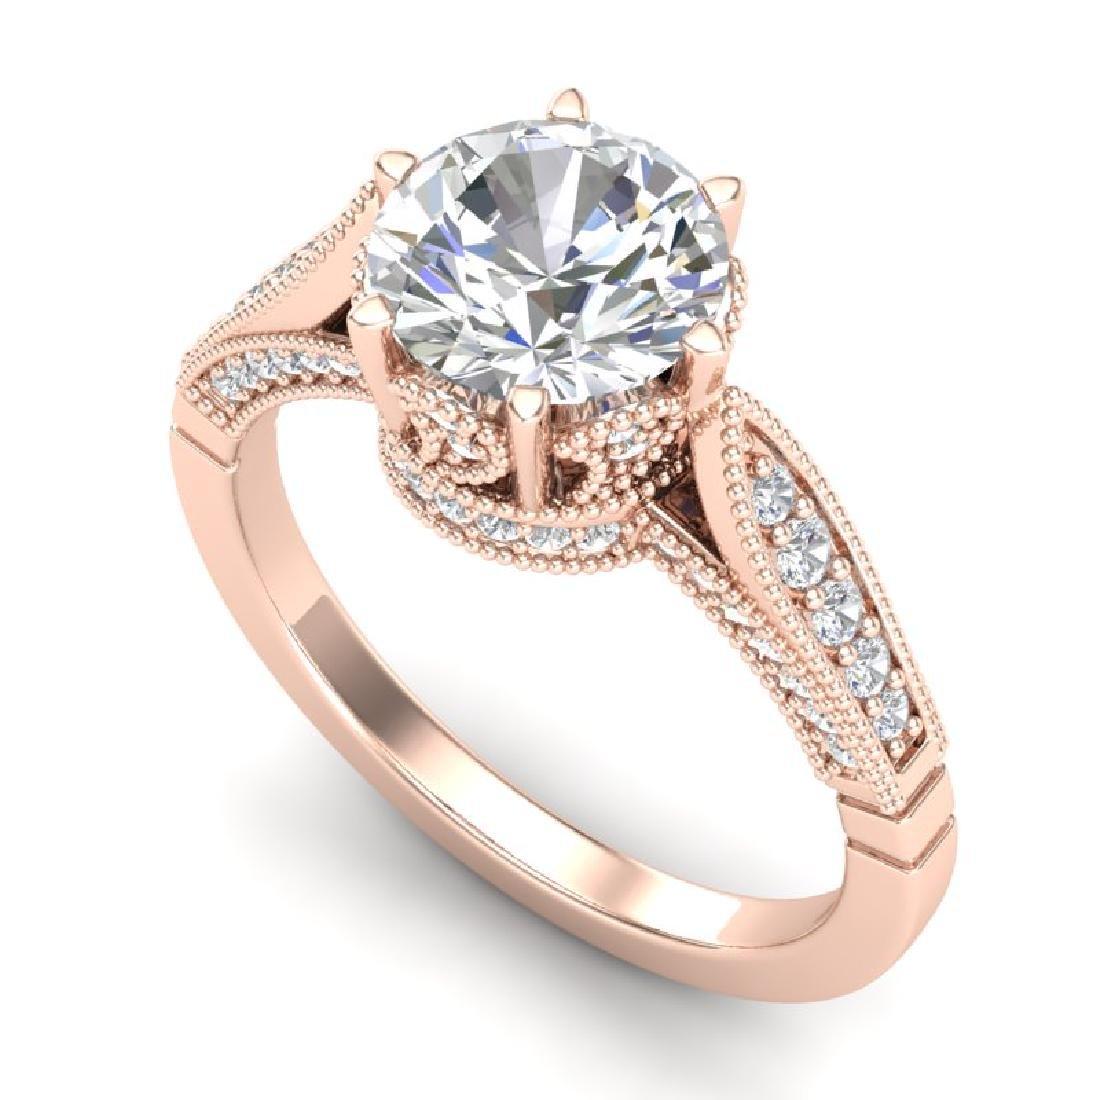 2.2 CTW VS/SI Diamond Art Deco Ring 18K Rose Gold